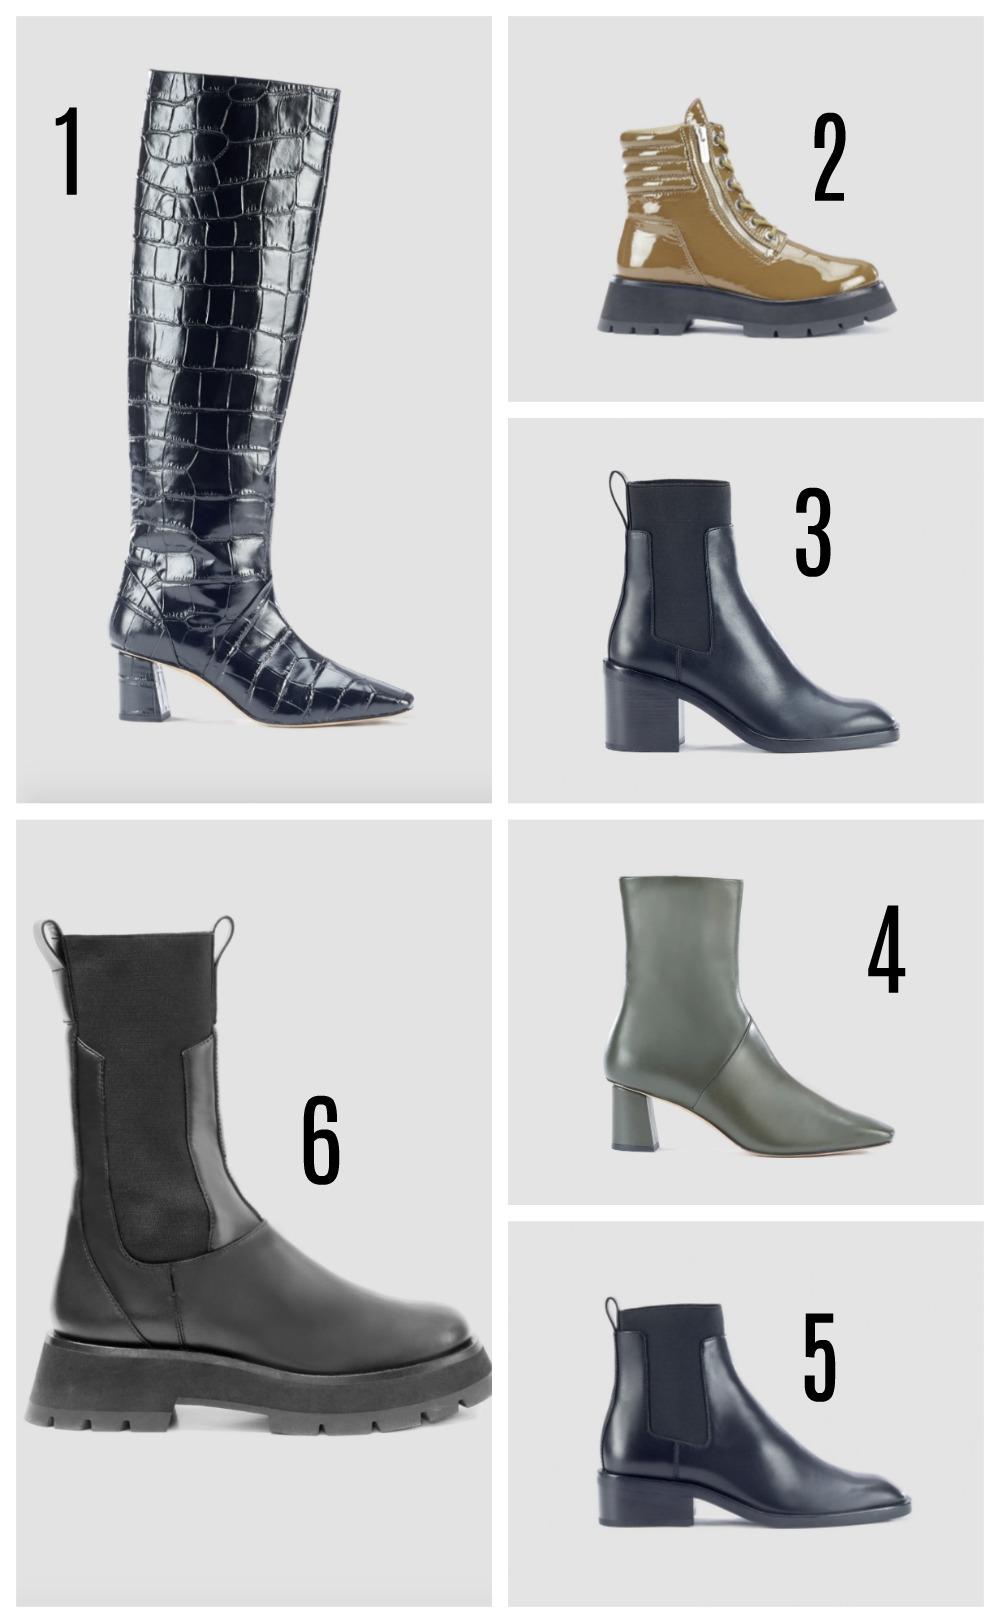 3.1 Phillip Lim Fall 2020 Boots Lineup I DreaminLace.com